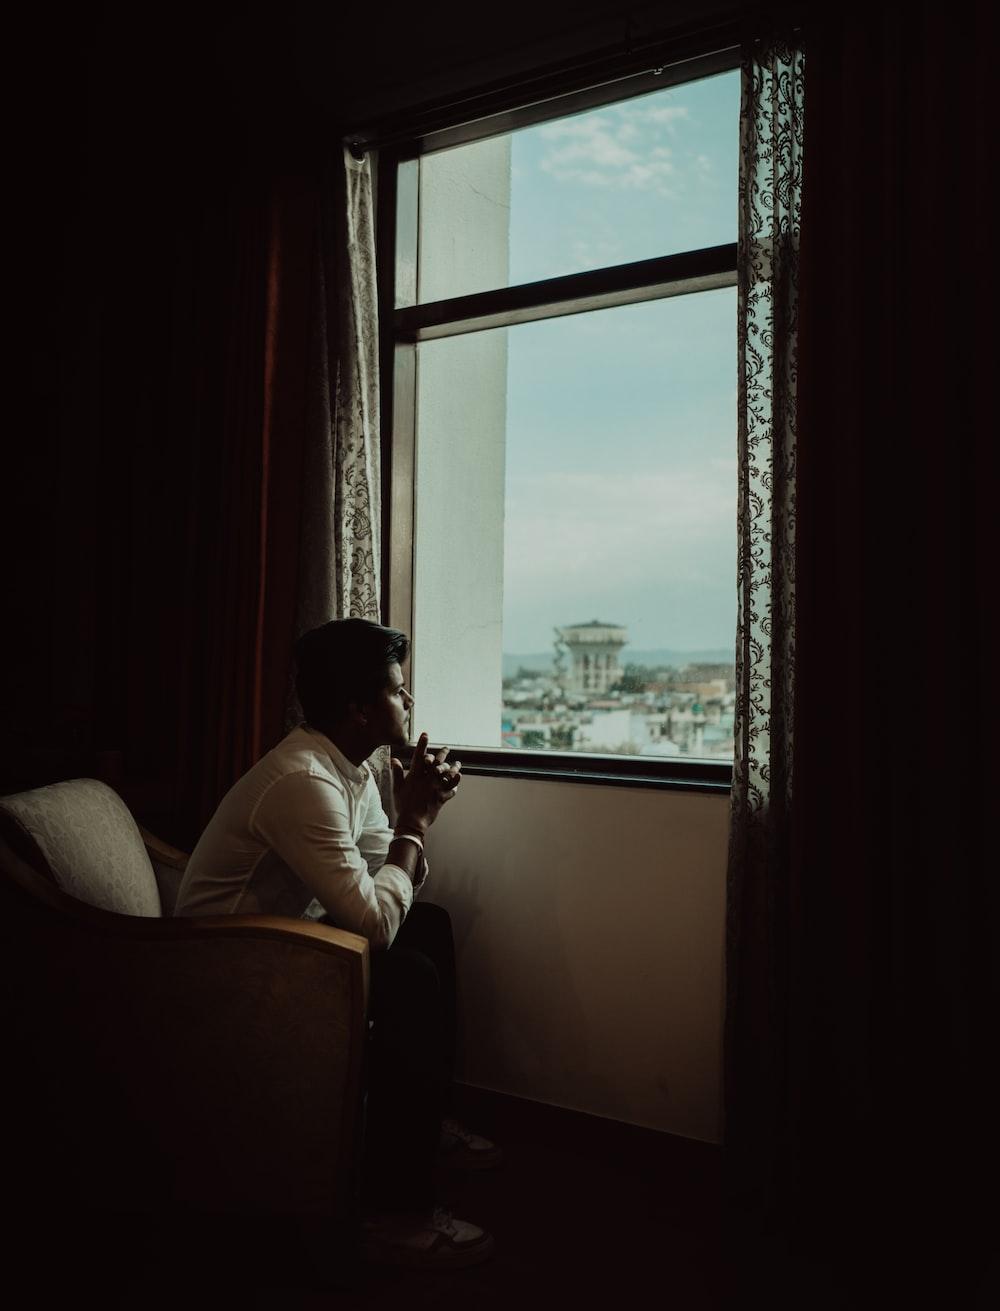 man in white dress shirt sitting on chair near window during daytime